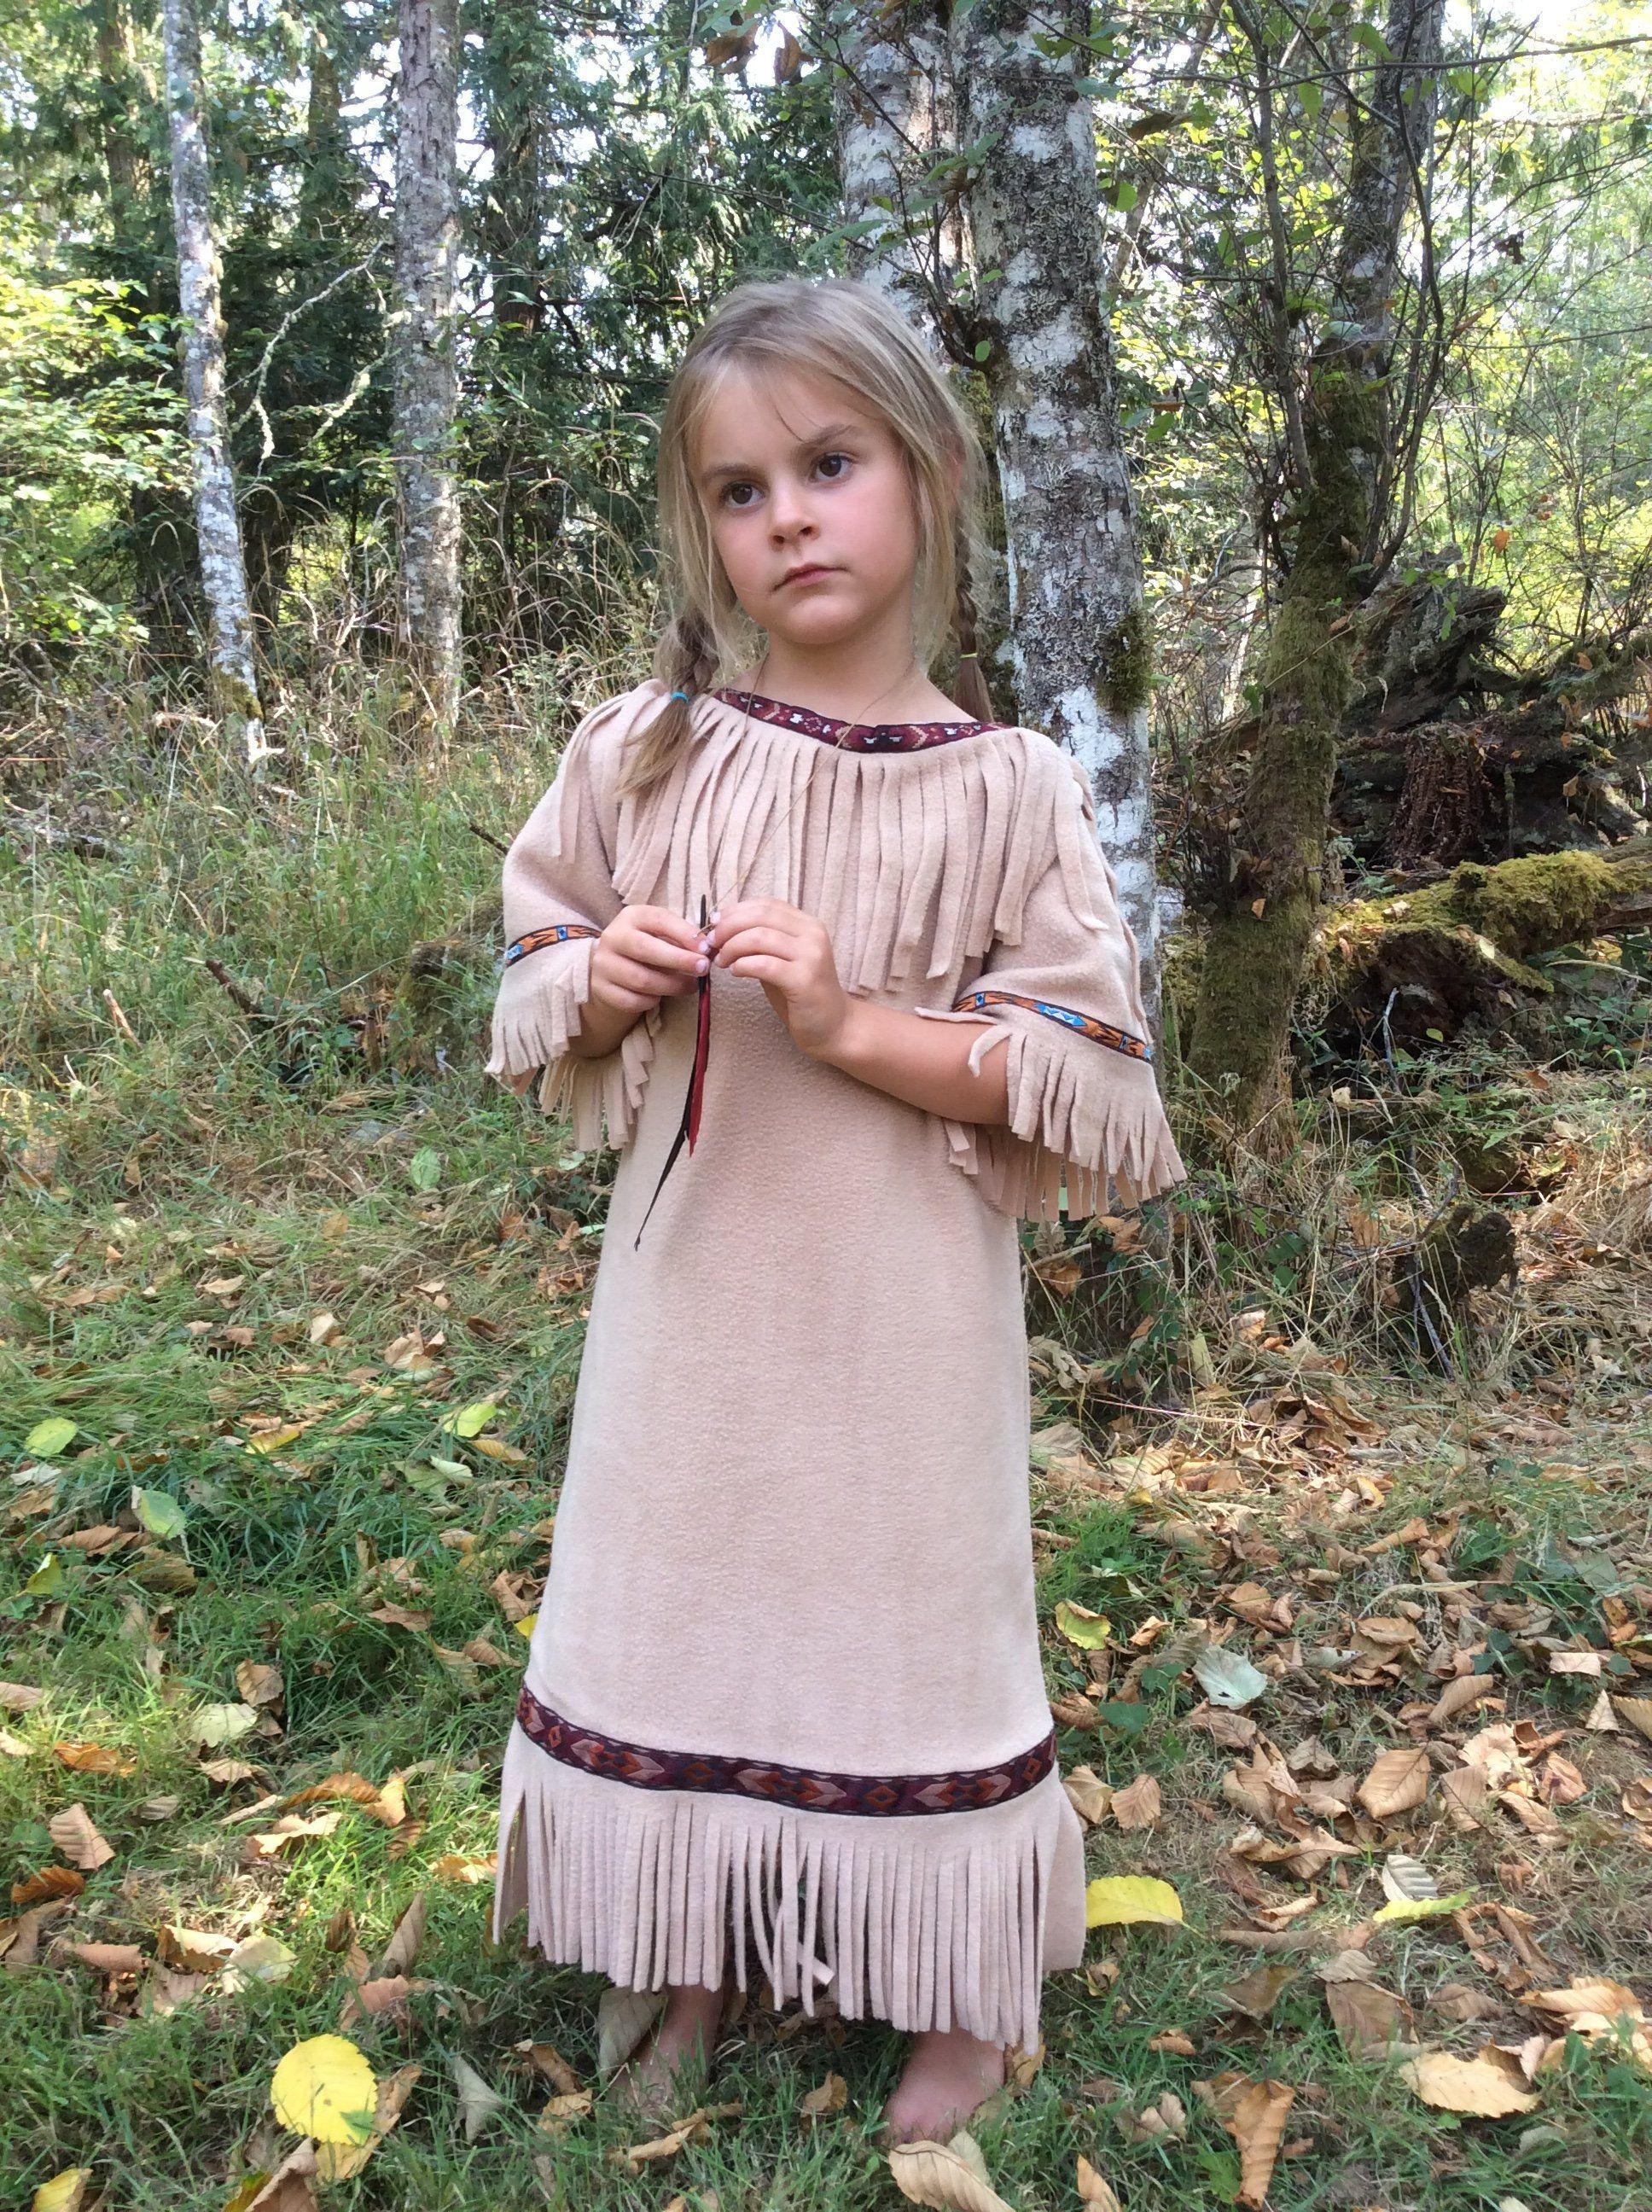 Trapper Halloween Costumes 2020 Frontier Trapper Costume buckskin dress kids costume | Etsy in